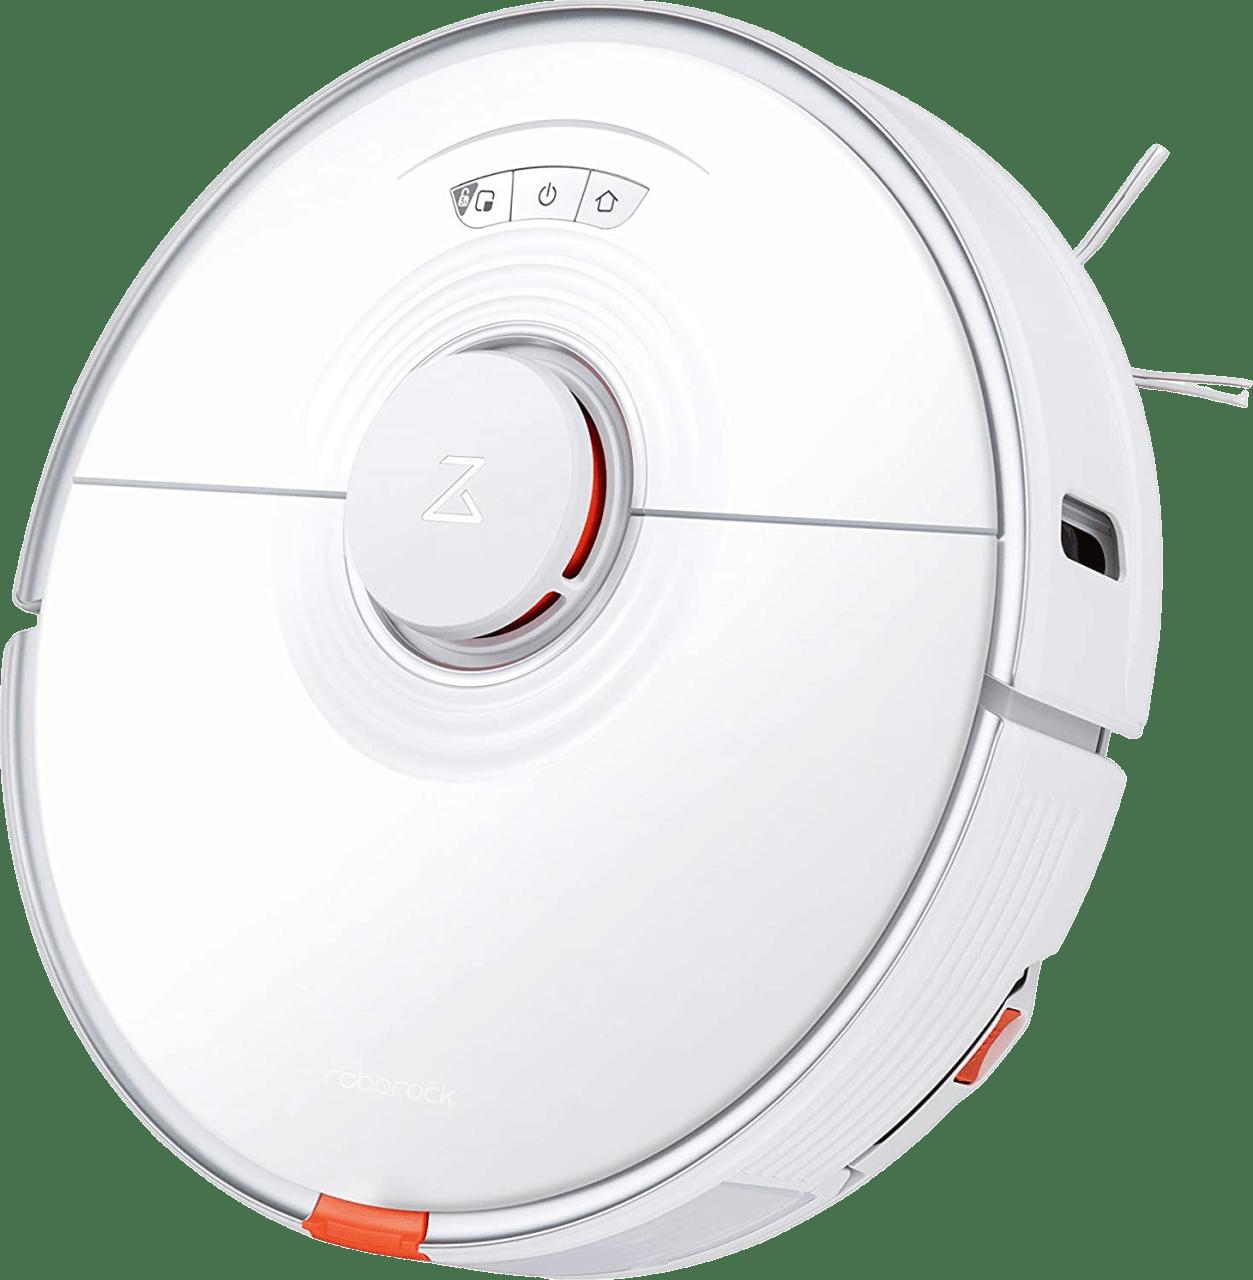 White Roborock S7 Vacuum & Mop Robot Cleaner.1